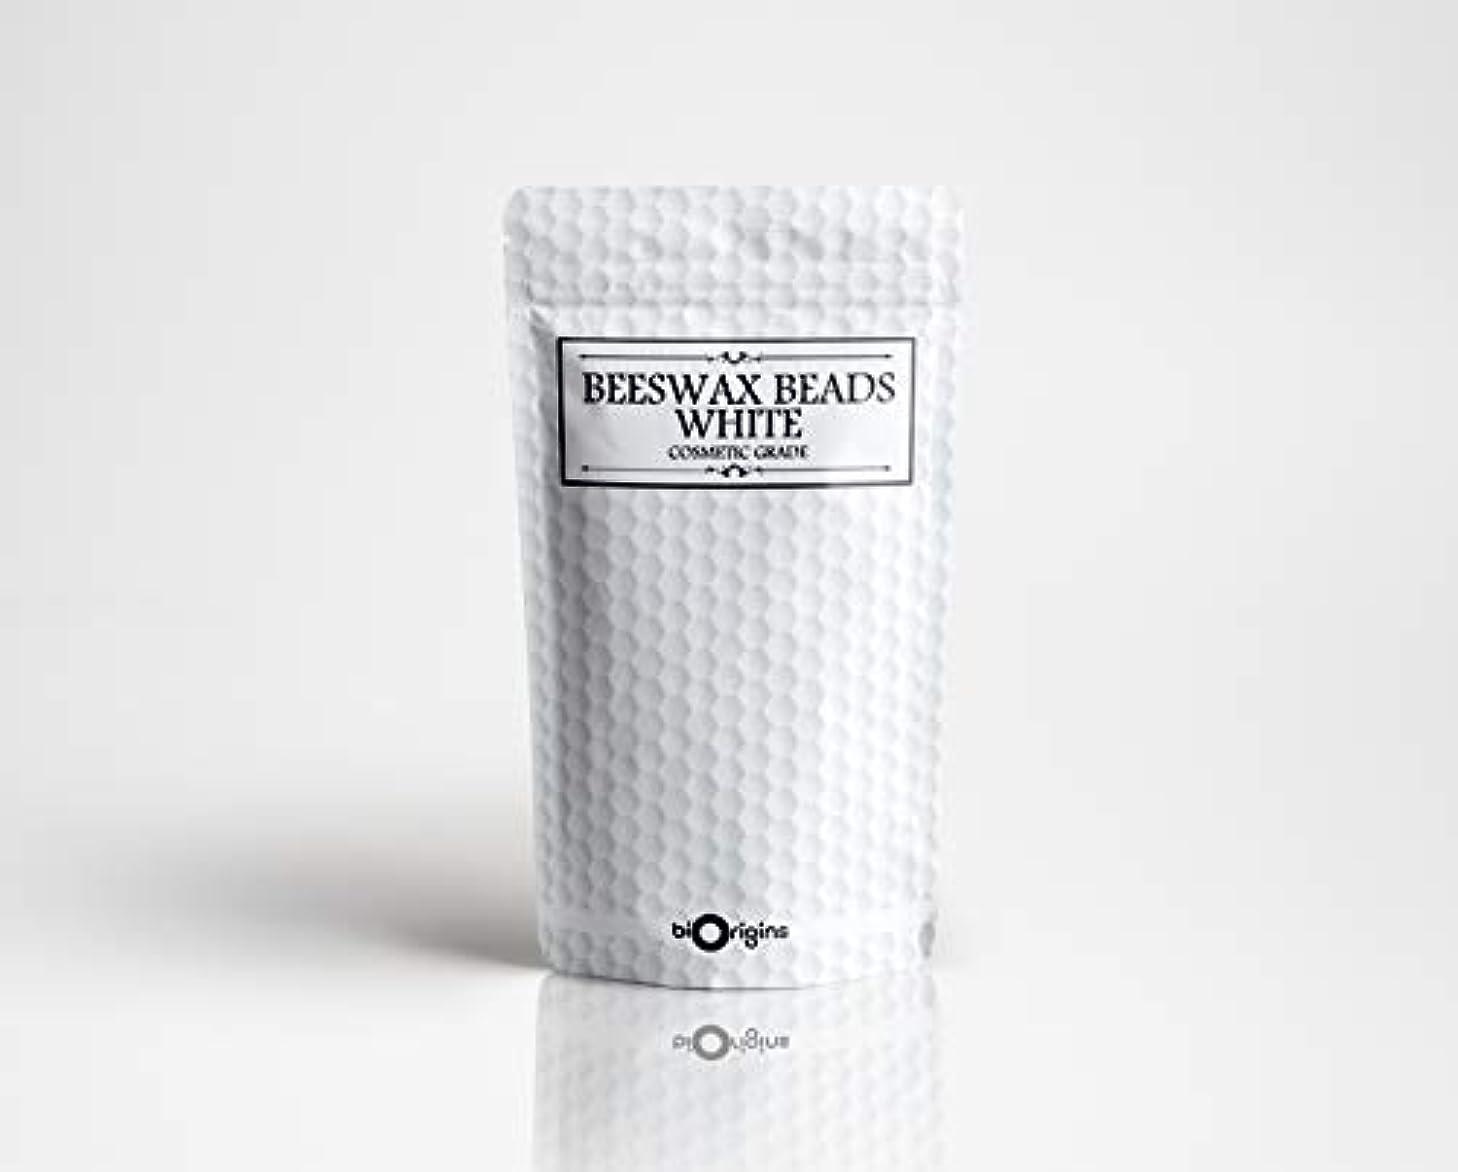 Beeswax Beads White - Cosmetic Grade - 100g